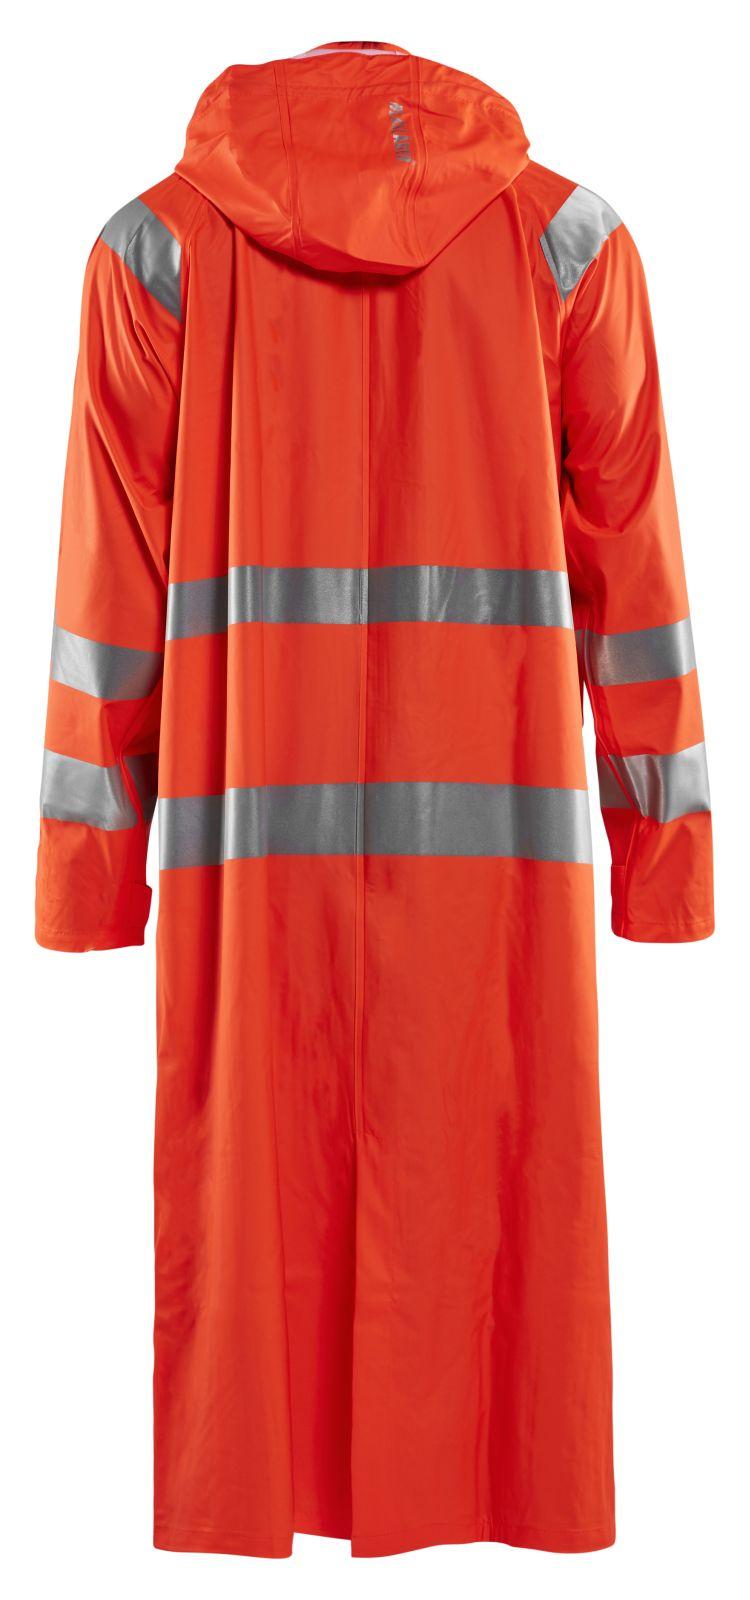 Blaklader Regenjassen 43252000 High Vis oranje(5300)